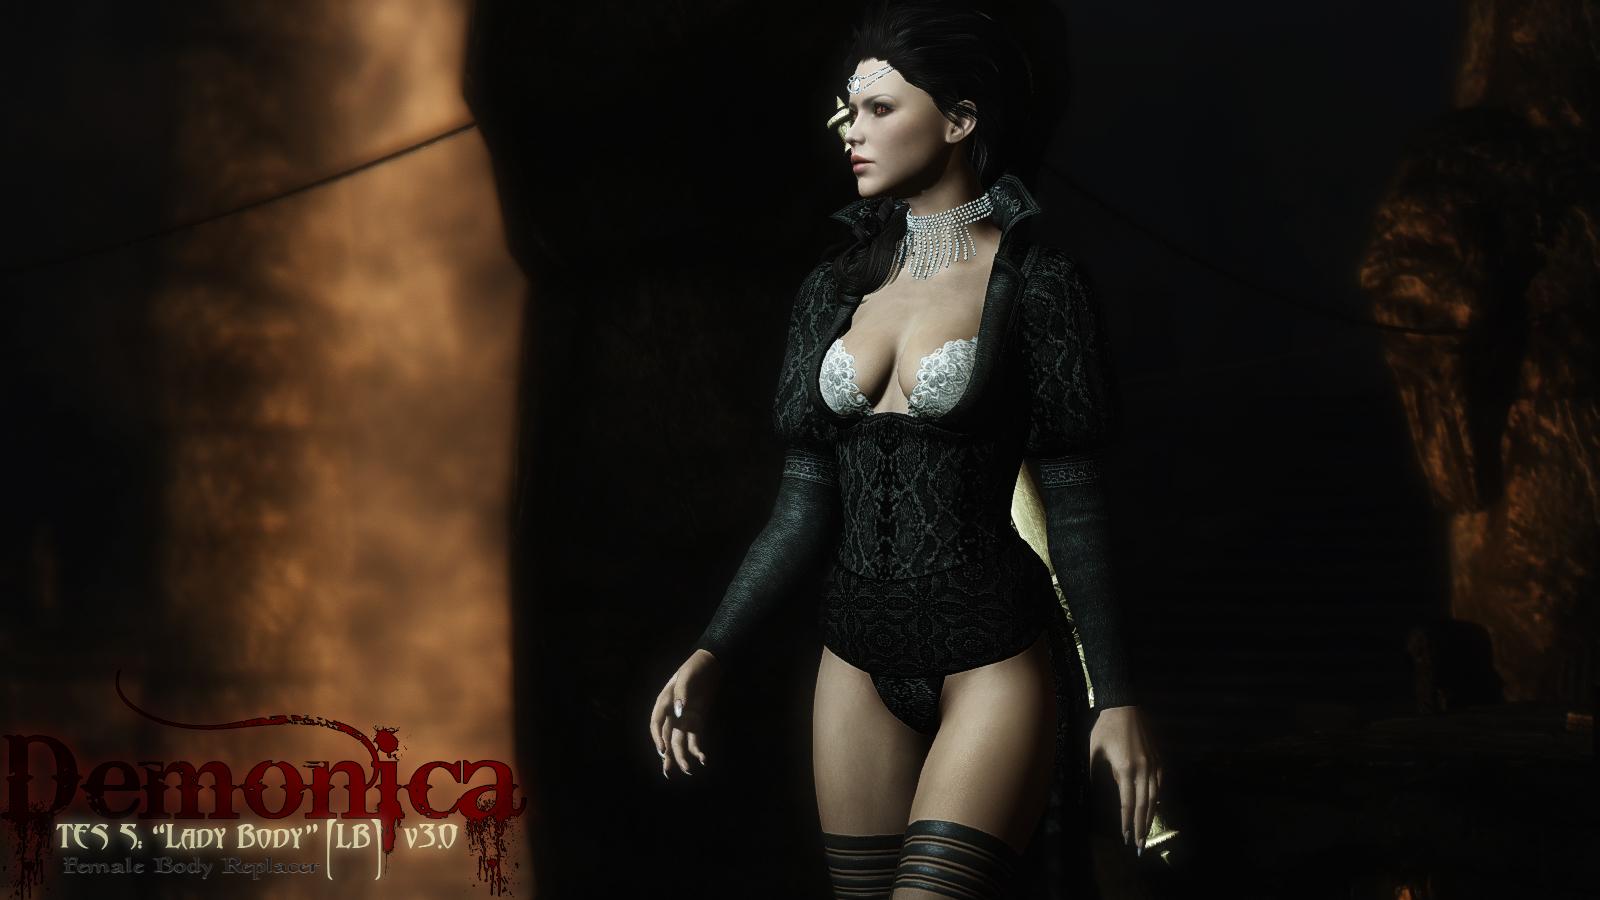 Lady sylvanas cosplay nude tube nackt pics